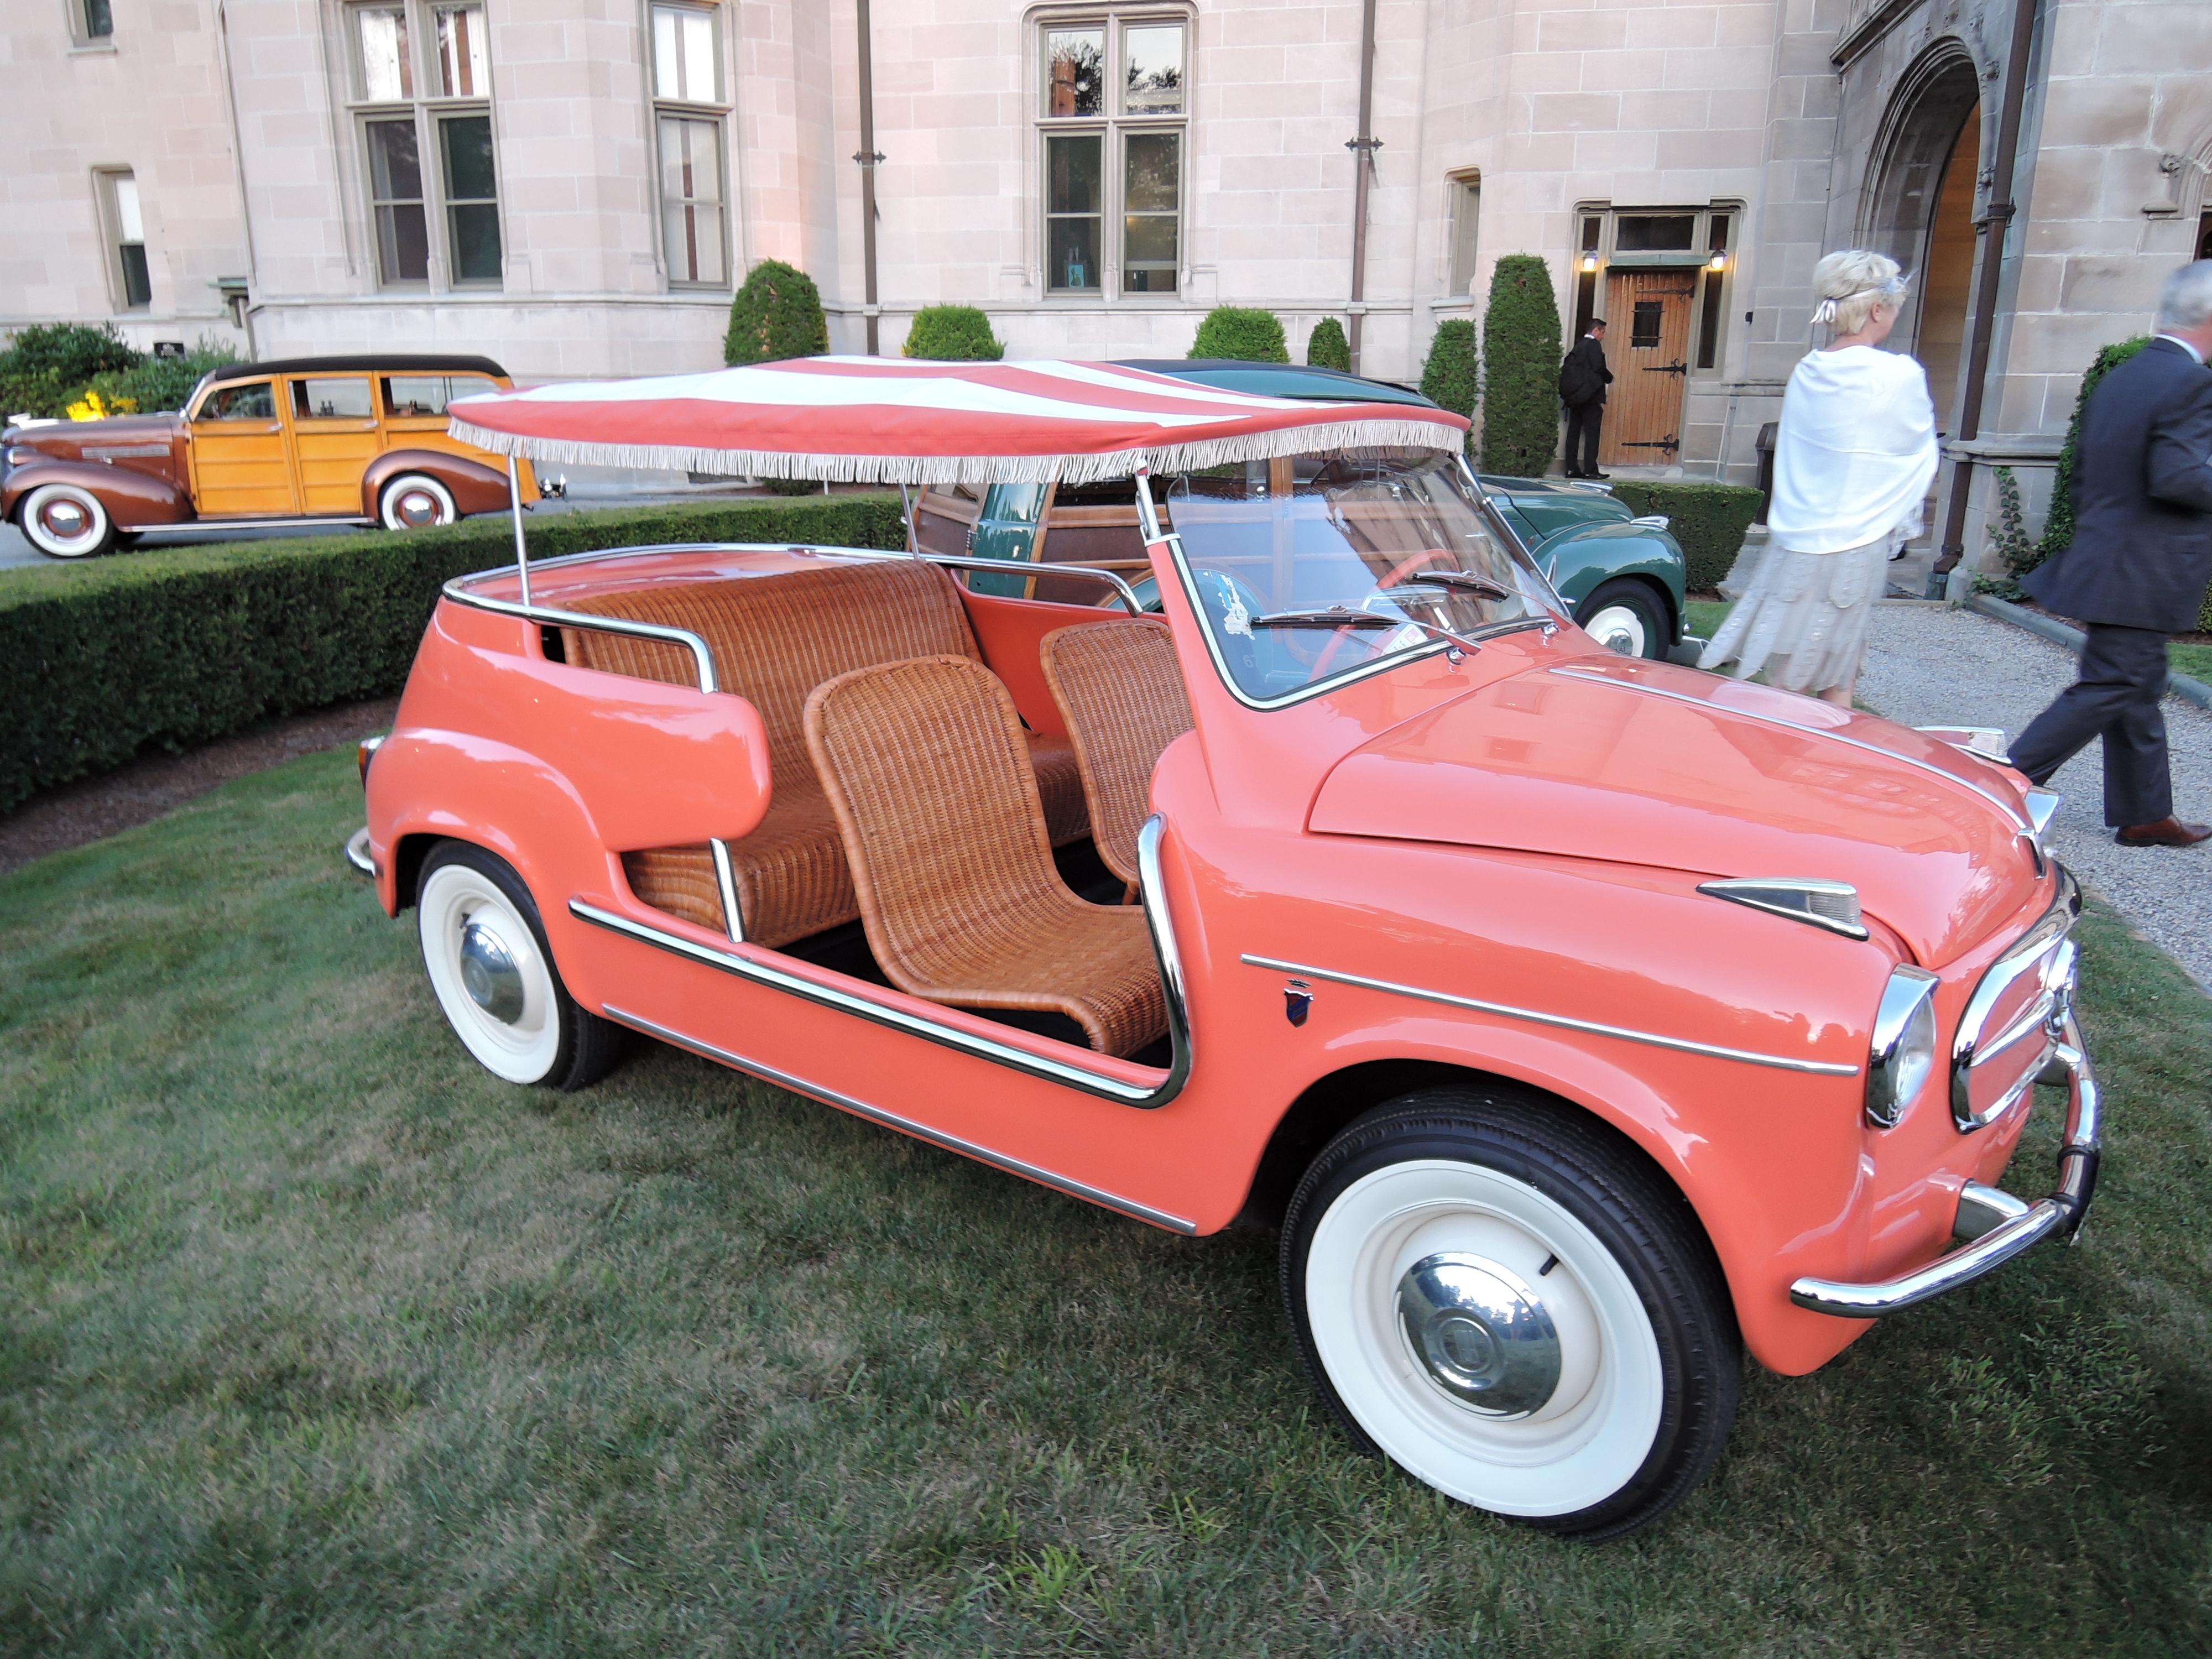 sherbert orange 1959 Fiat Jolly - Audrain Auto Museum Gala 2017